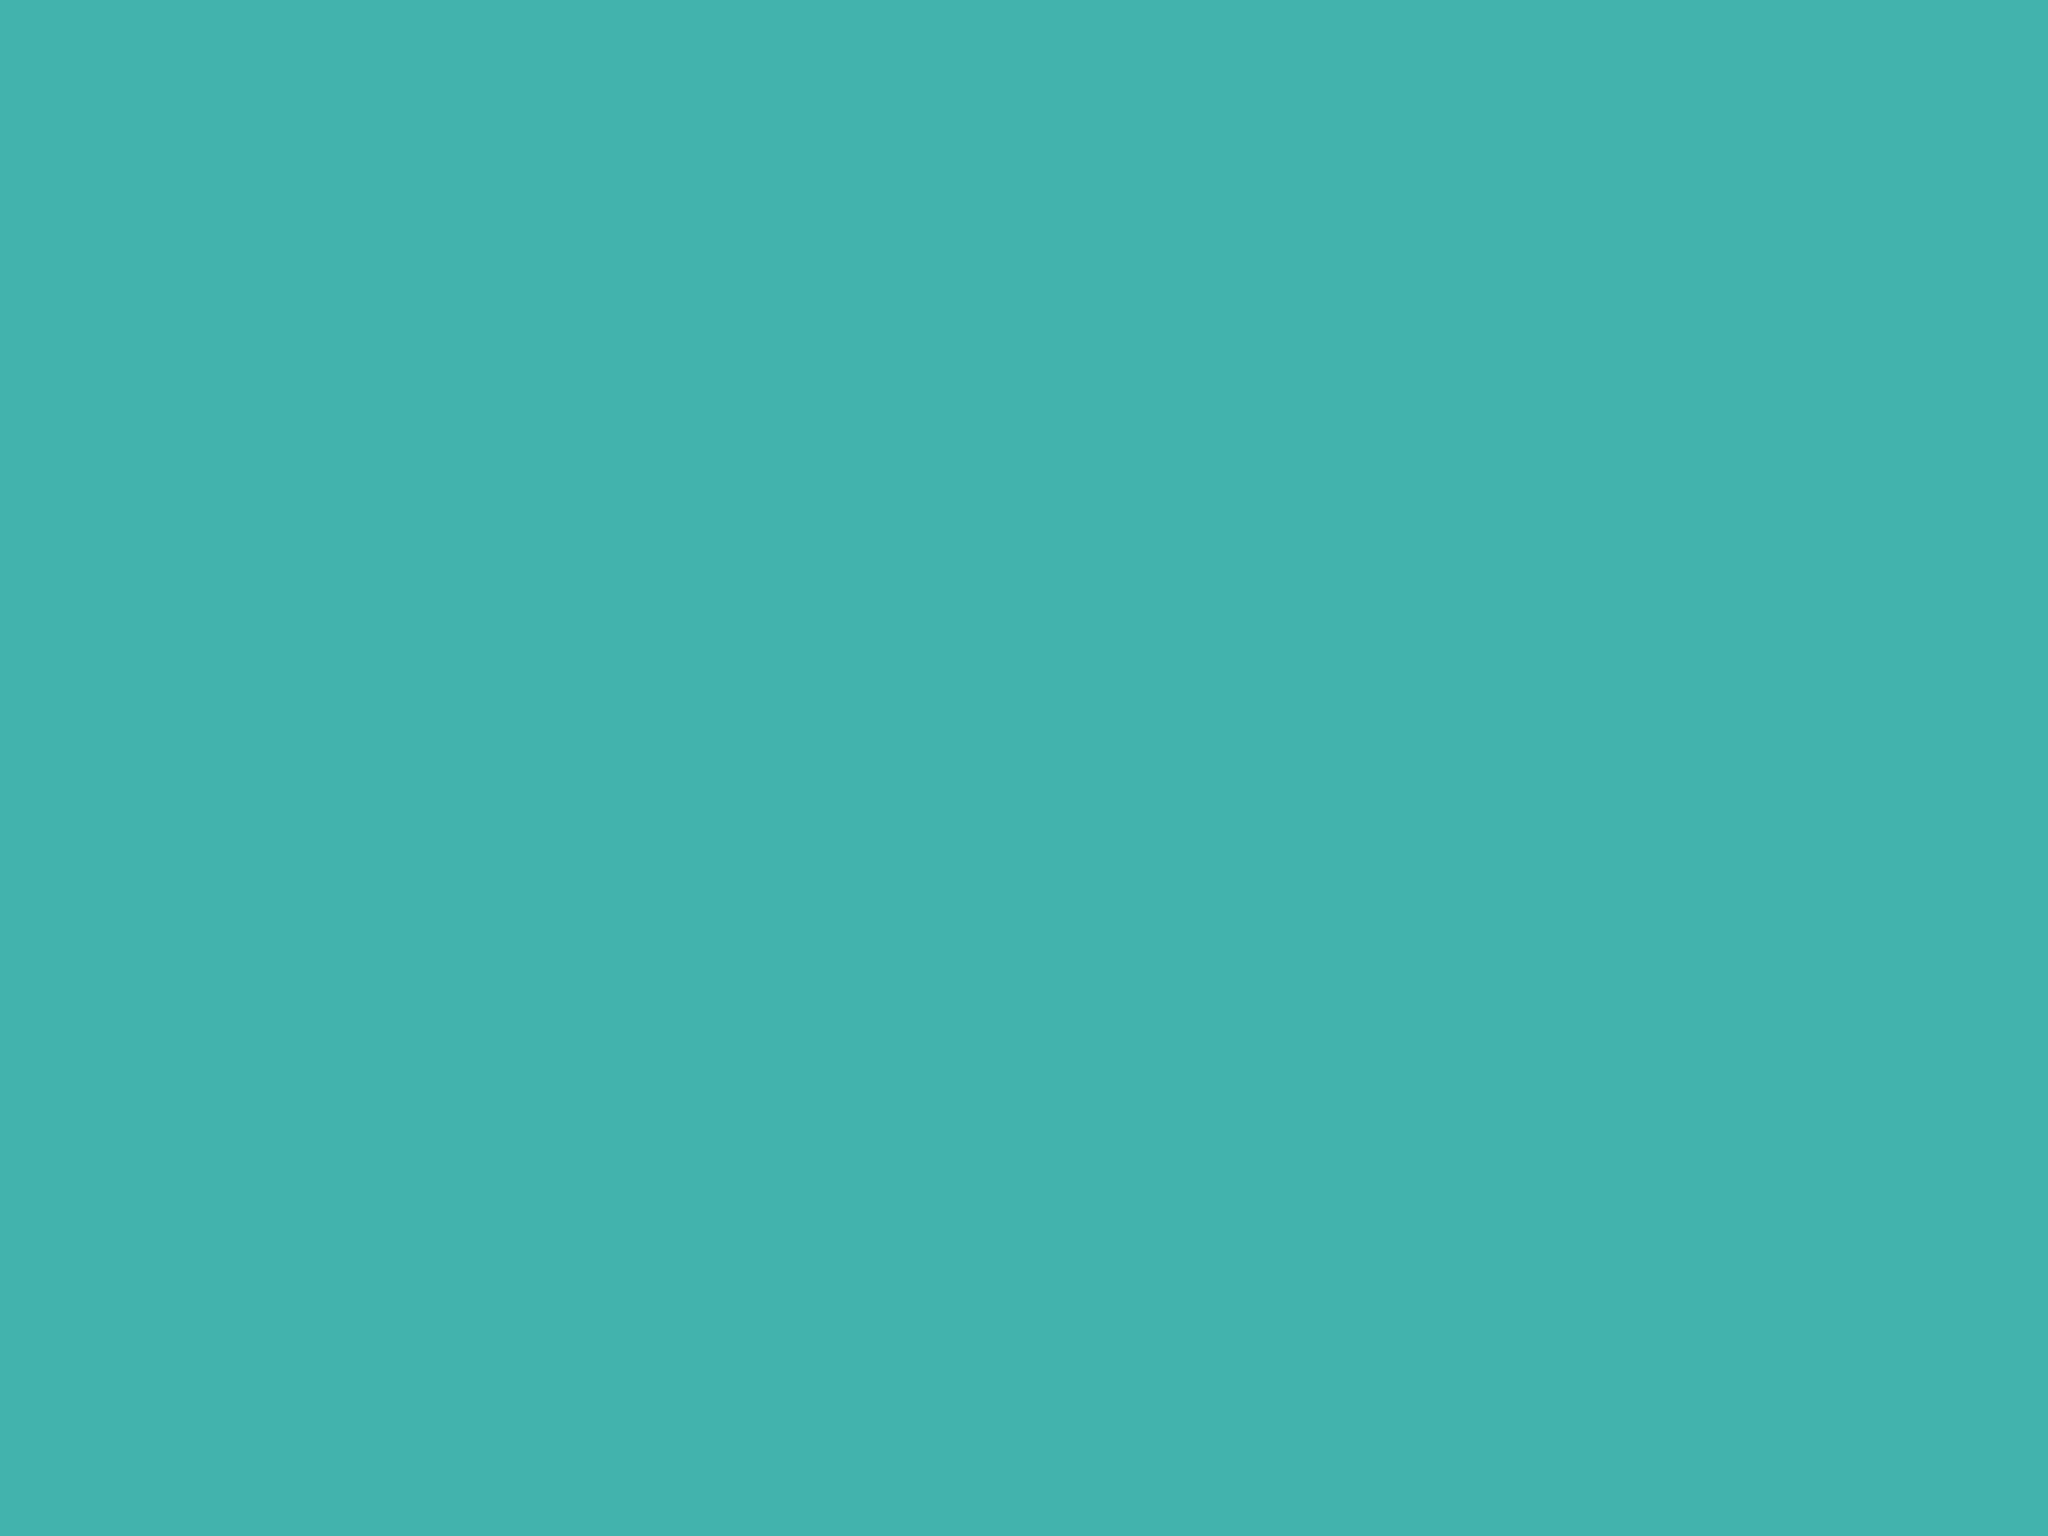 2048x1536 Verdigris Solid Color Background